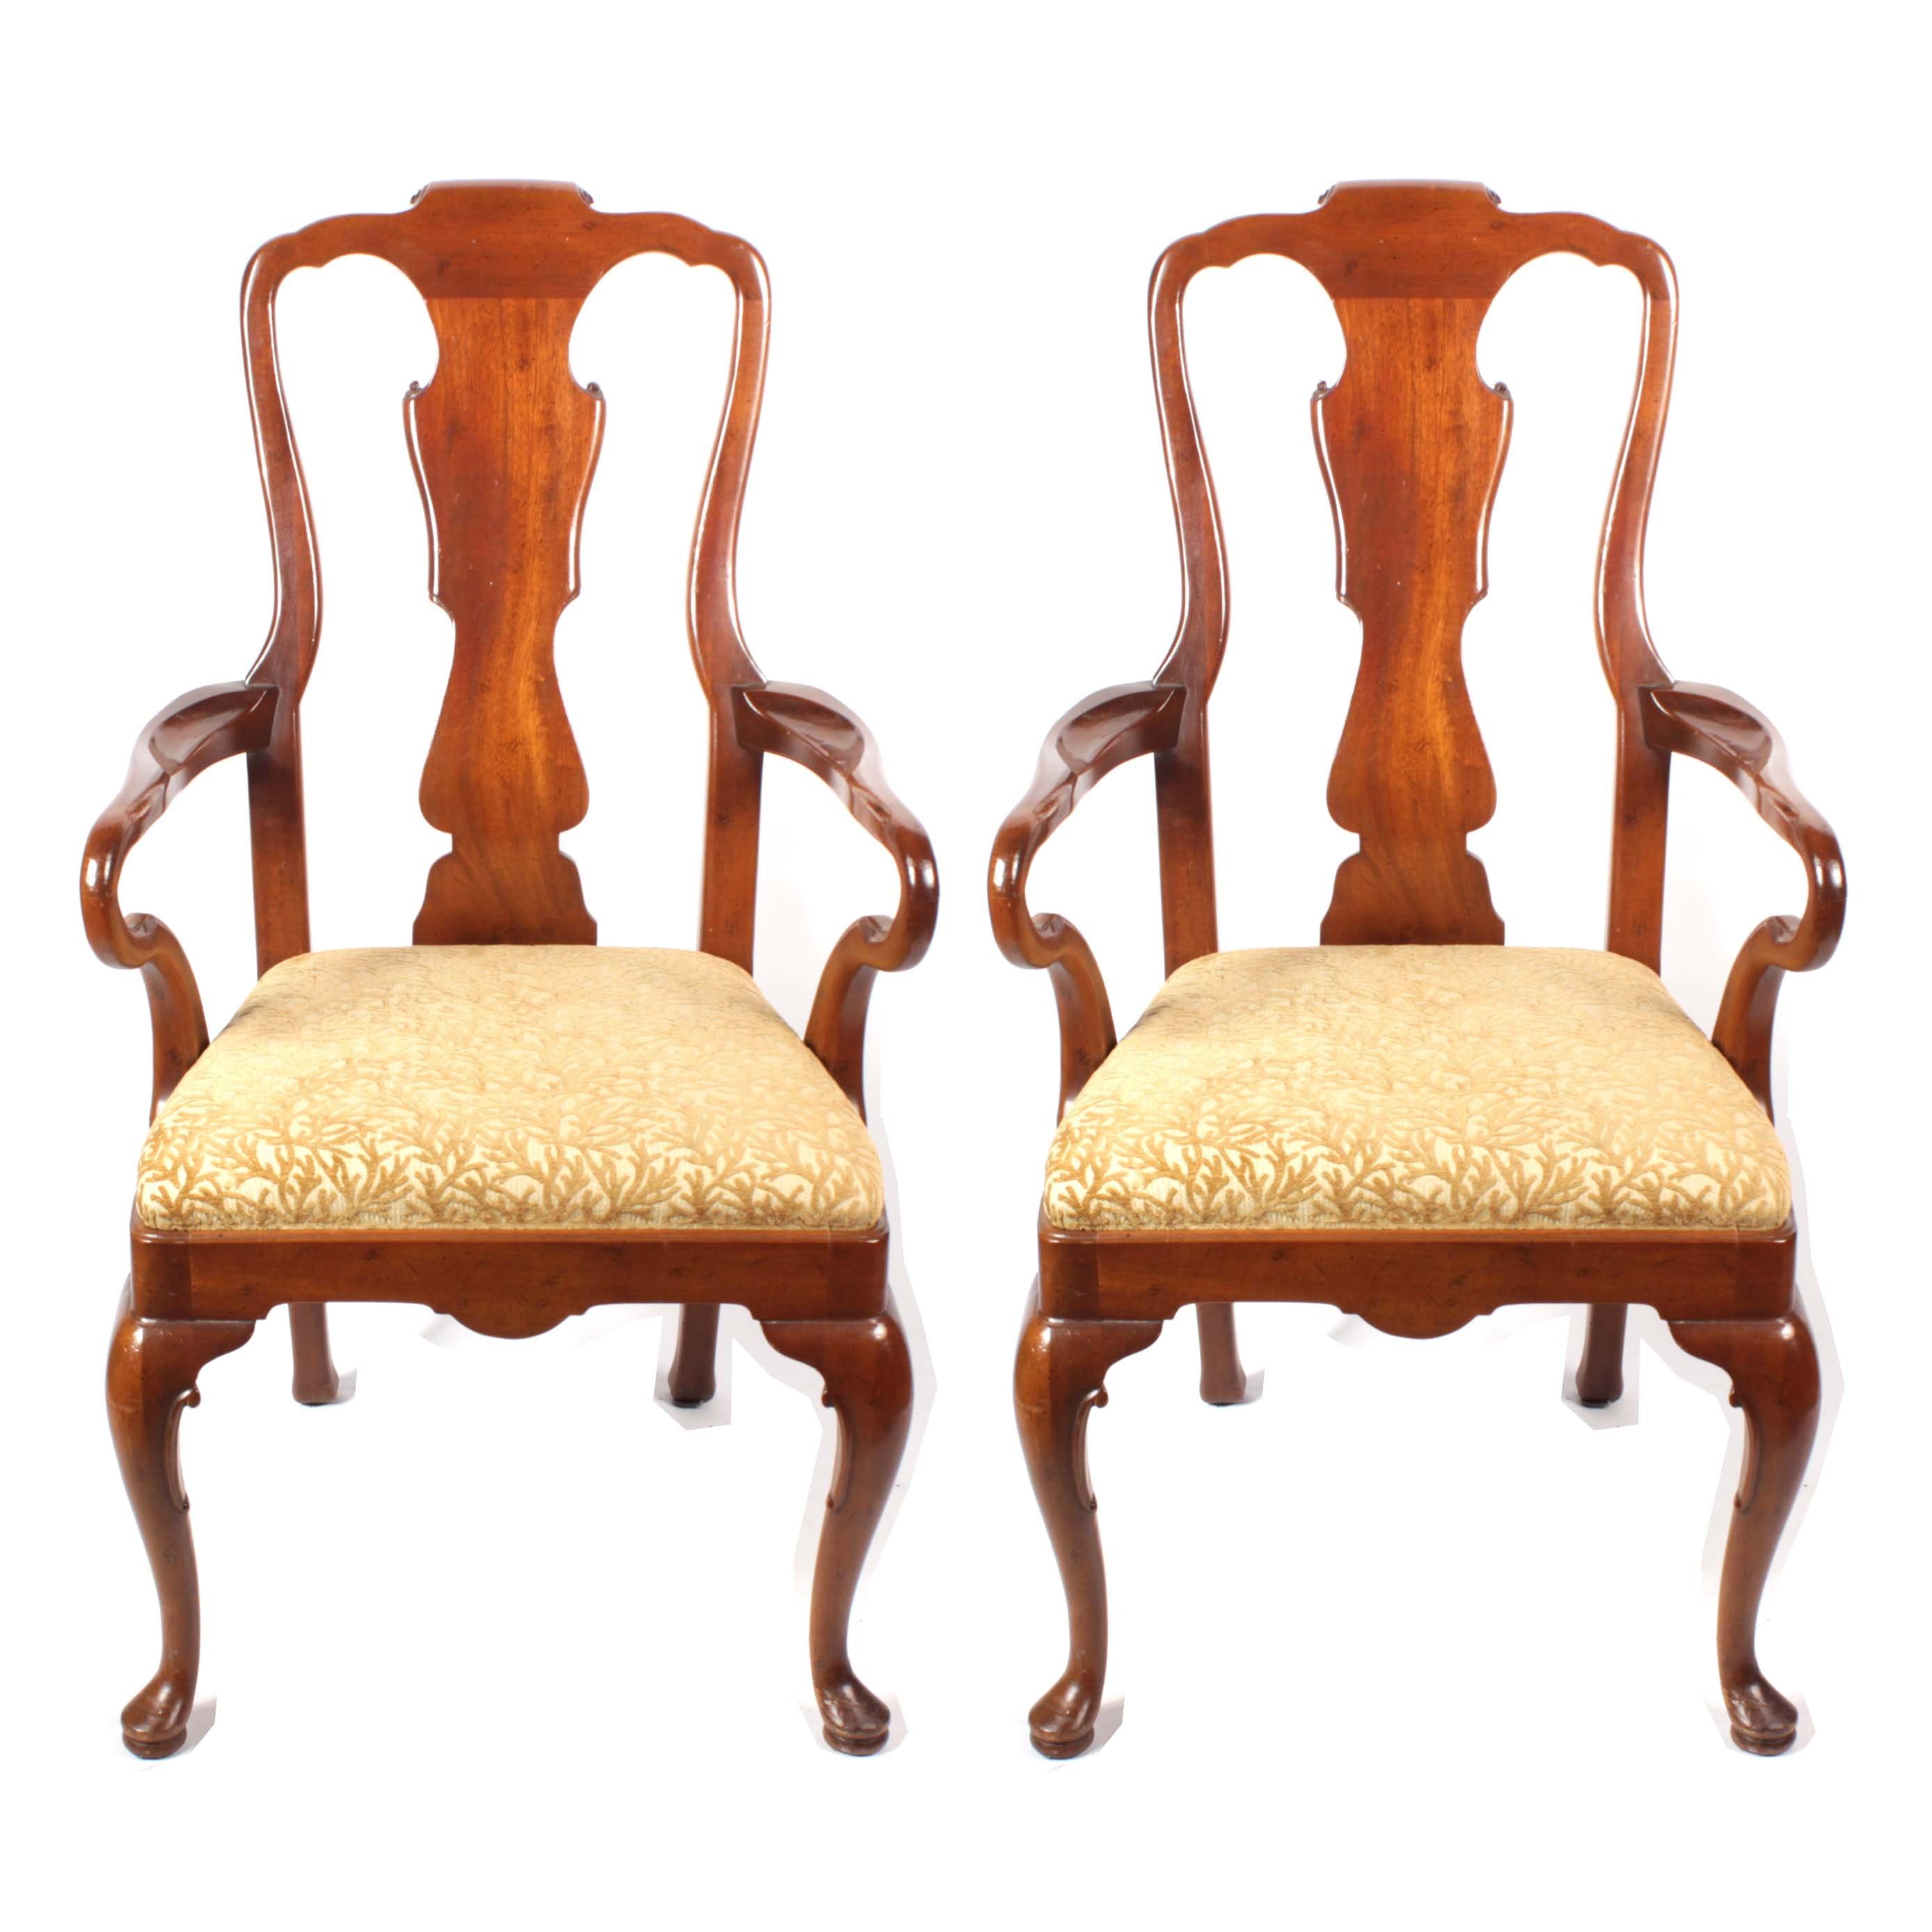 Henredon Queen Anne Style Walnut Finish Armchairs, 20th Century